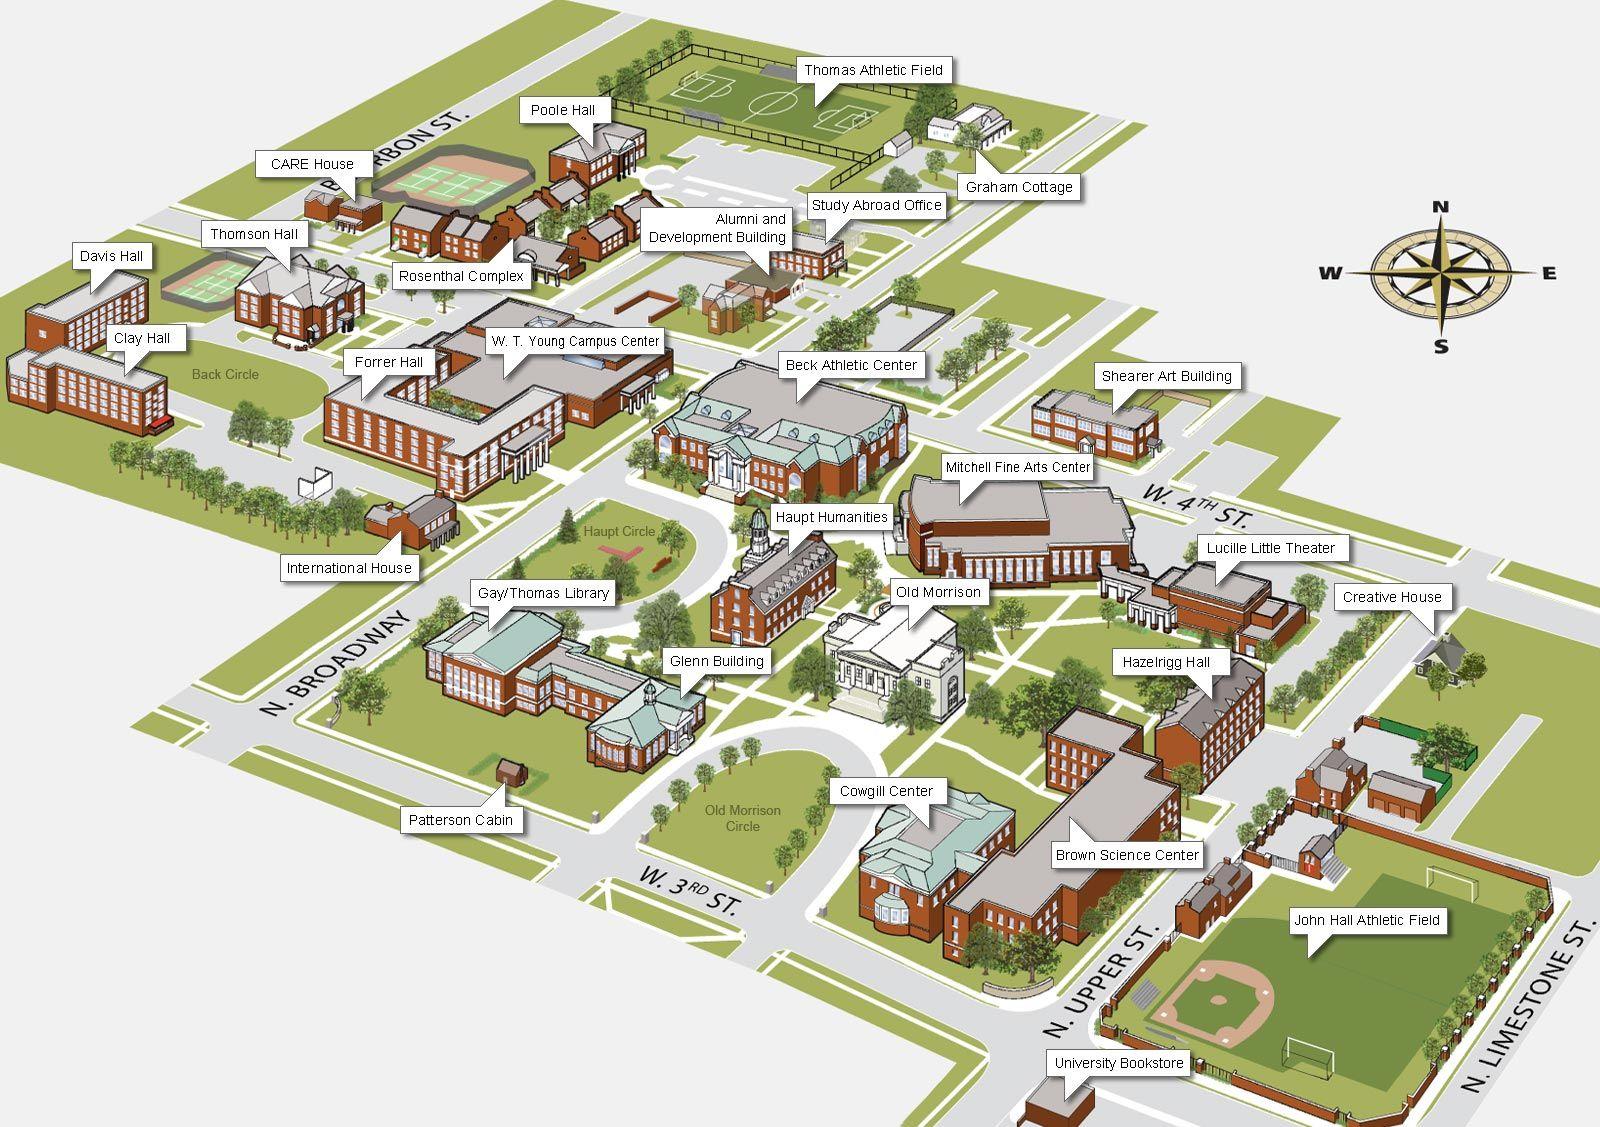 Sims 3 university freebies